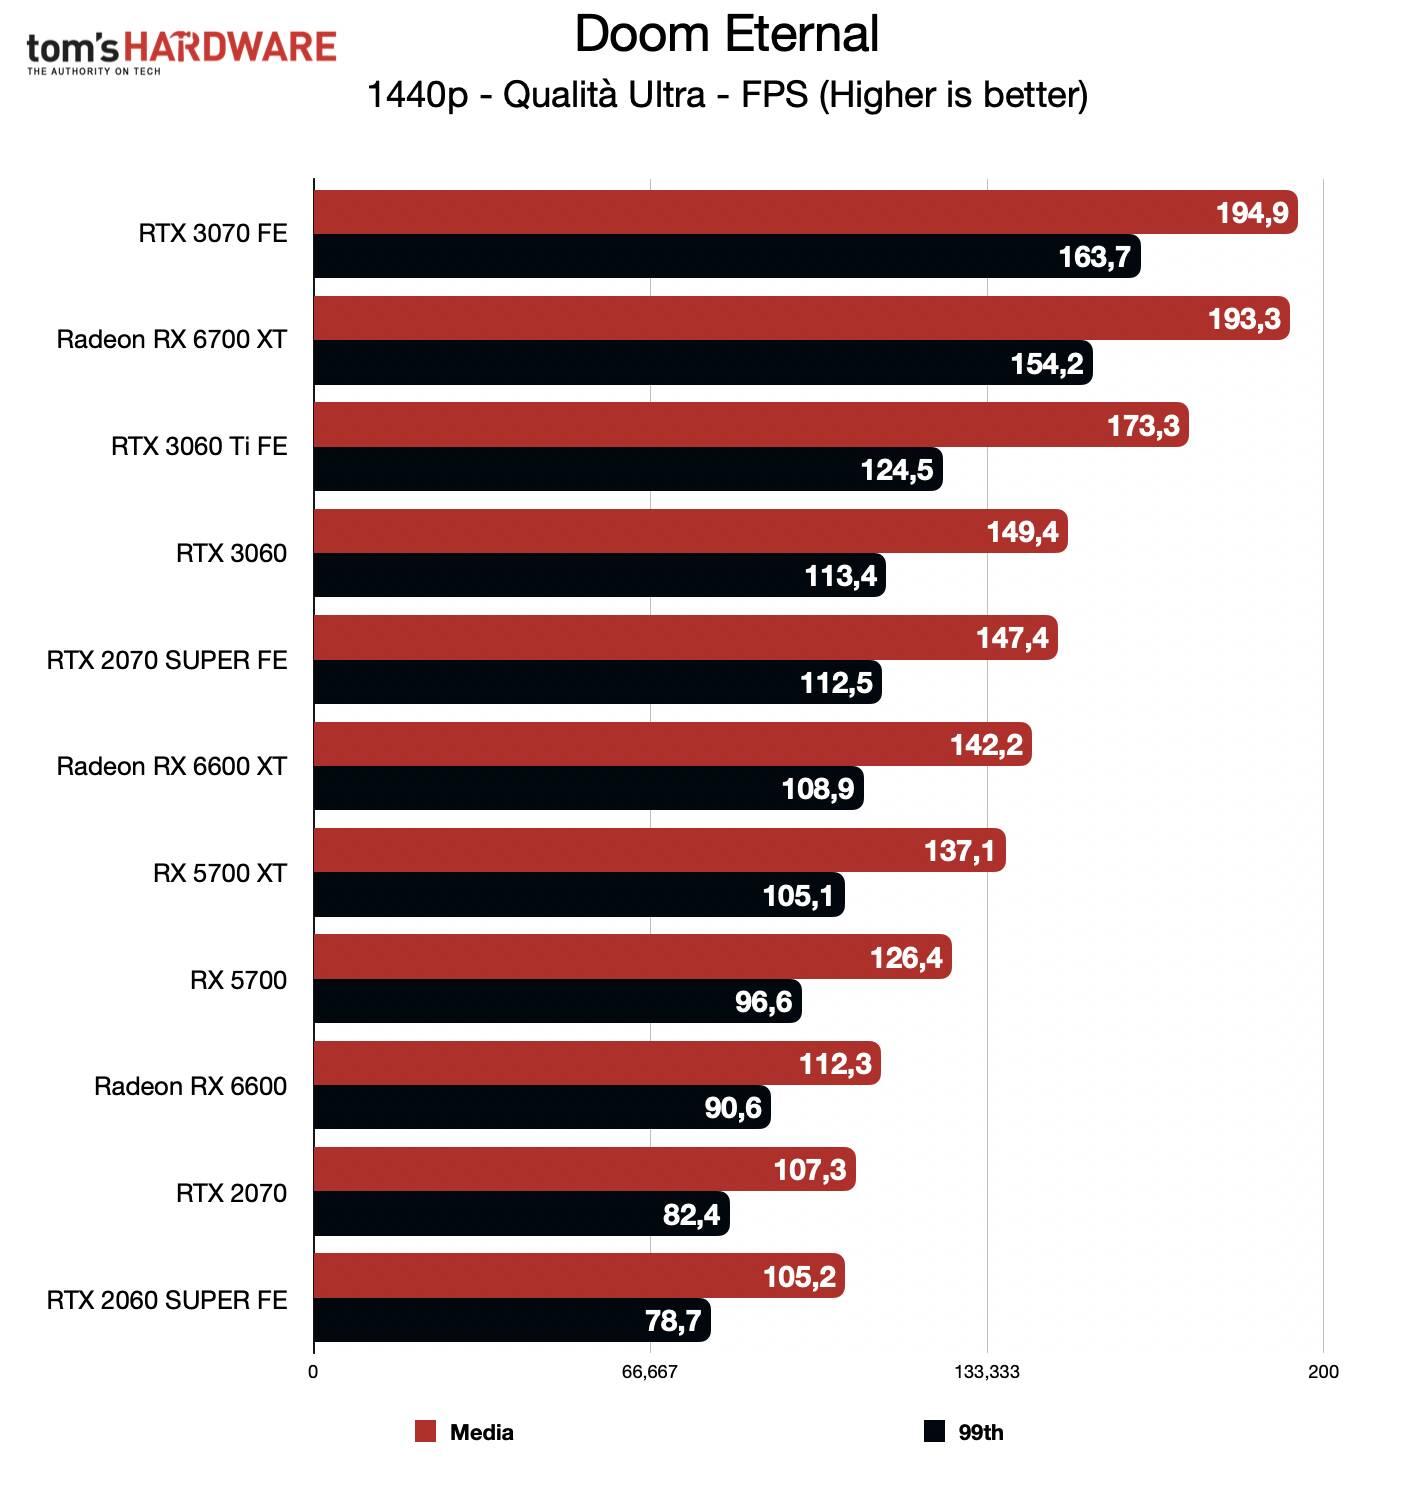 Benchmark Radeon RX 6600 - QHD - Doom Eternal